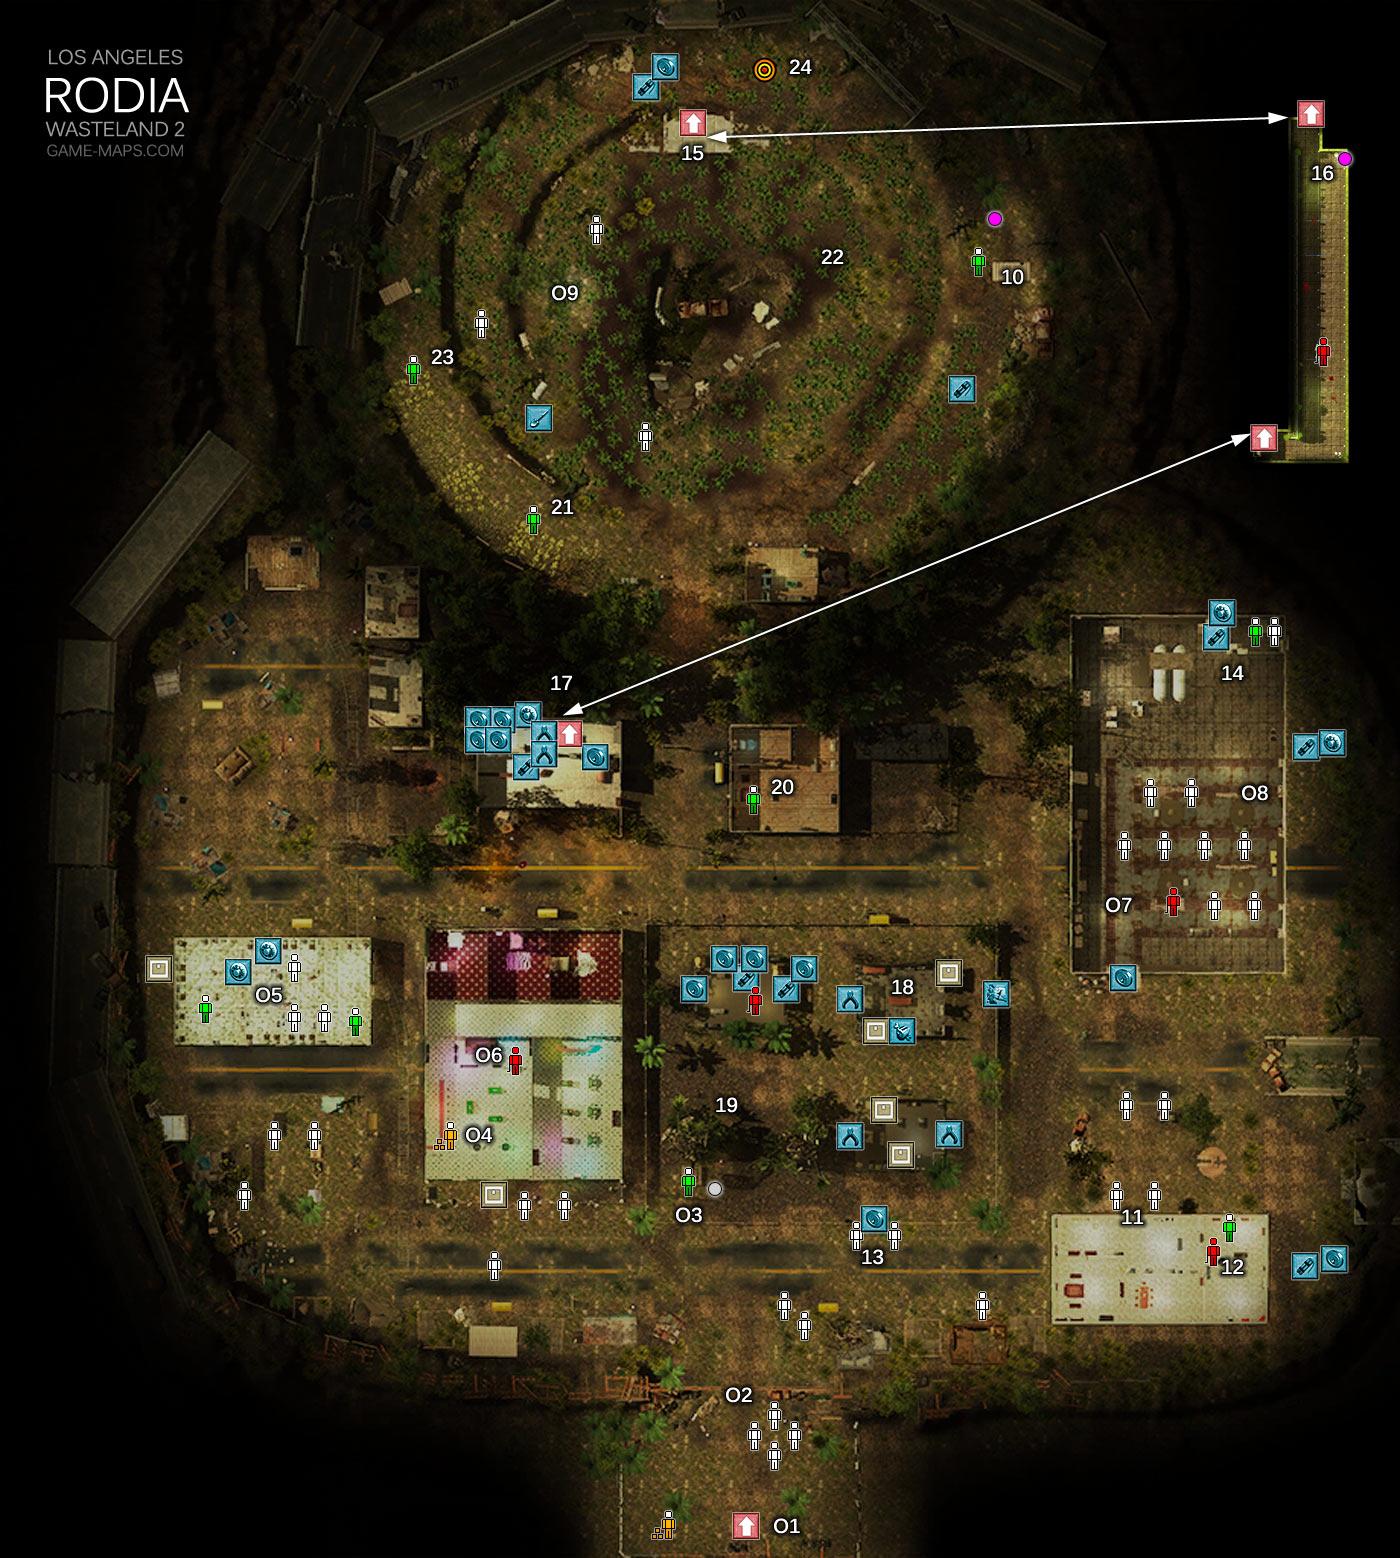 Rodia Los Angeles Wasteland 2 Game Maps Com